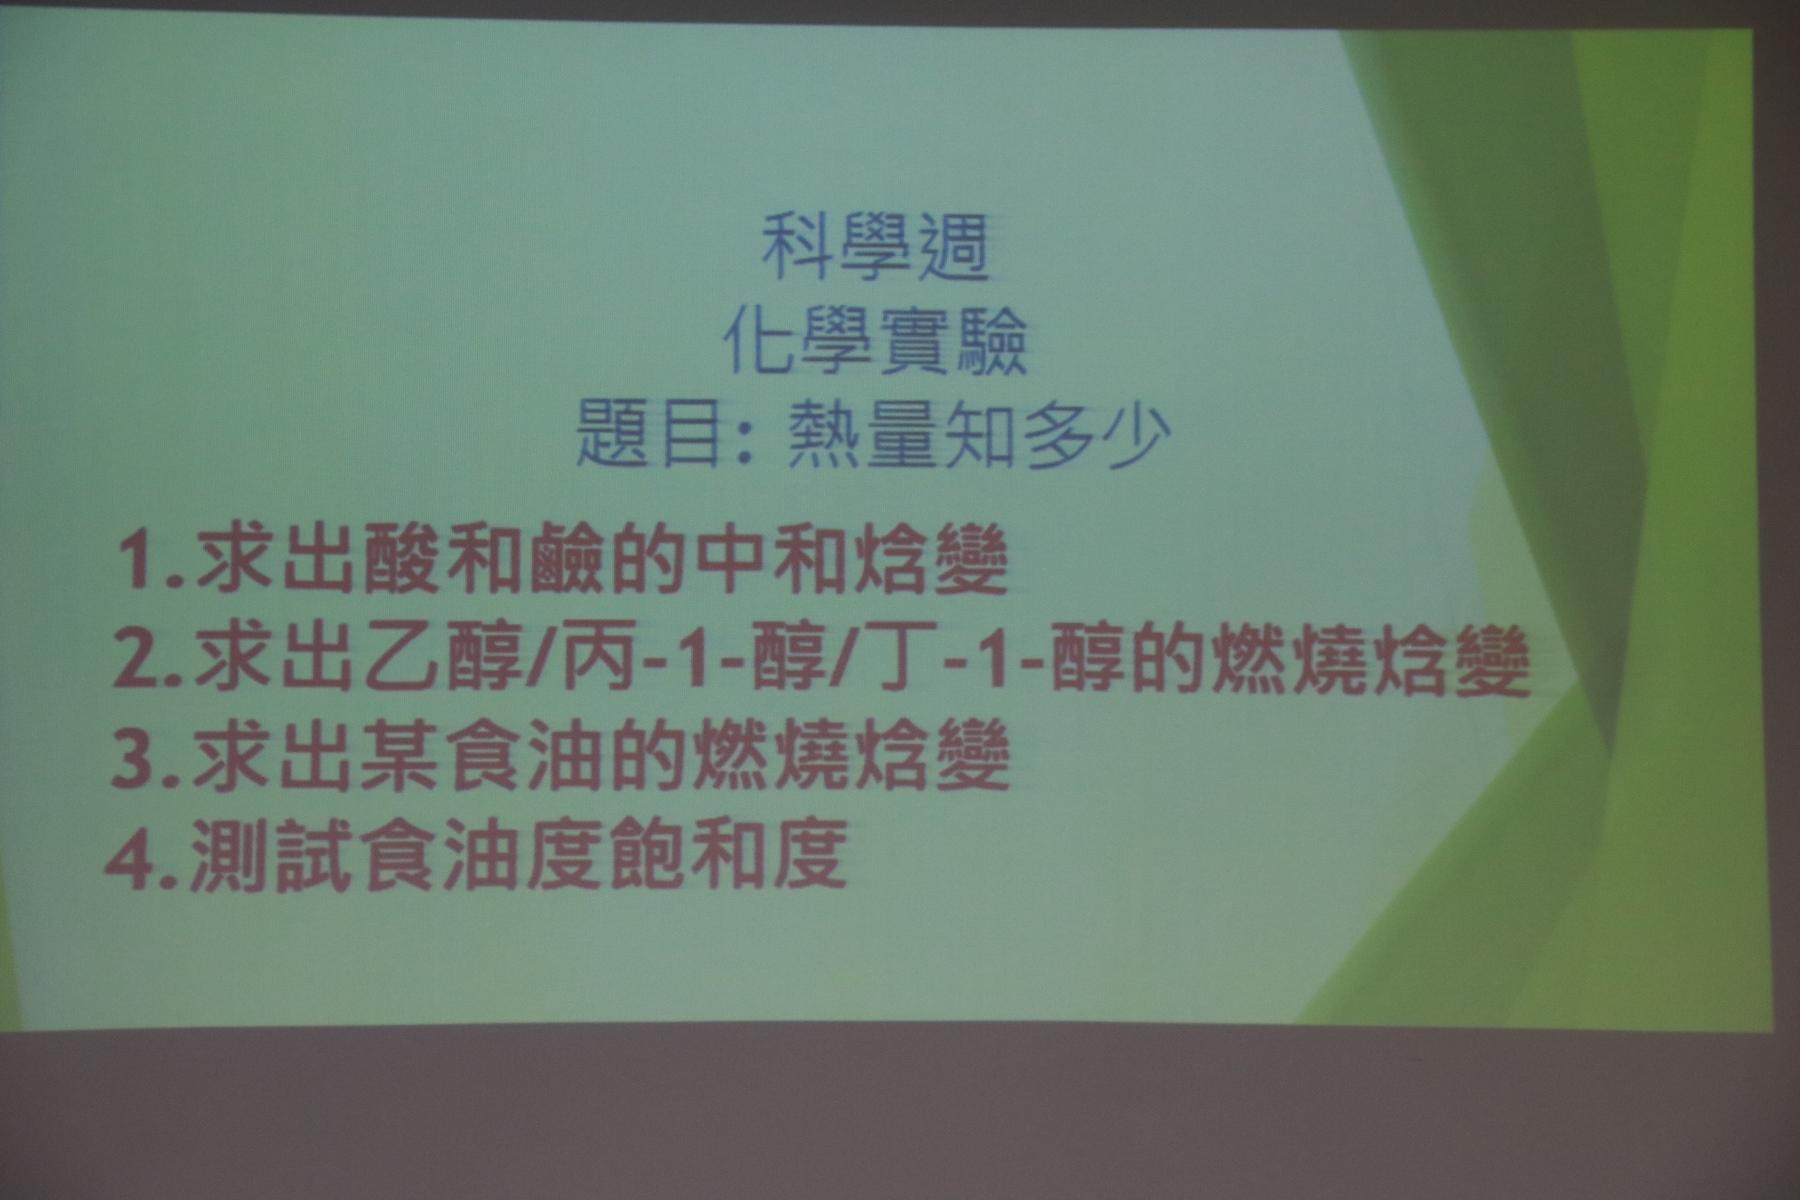 http://npc.edu.hk/sites/default/files/img_7456.jpg